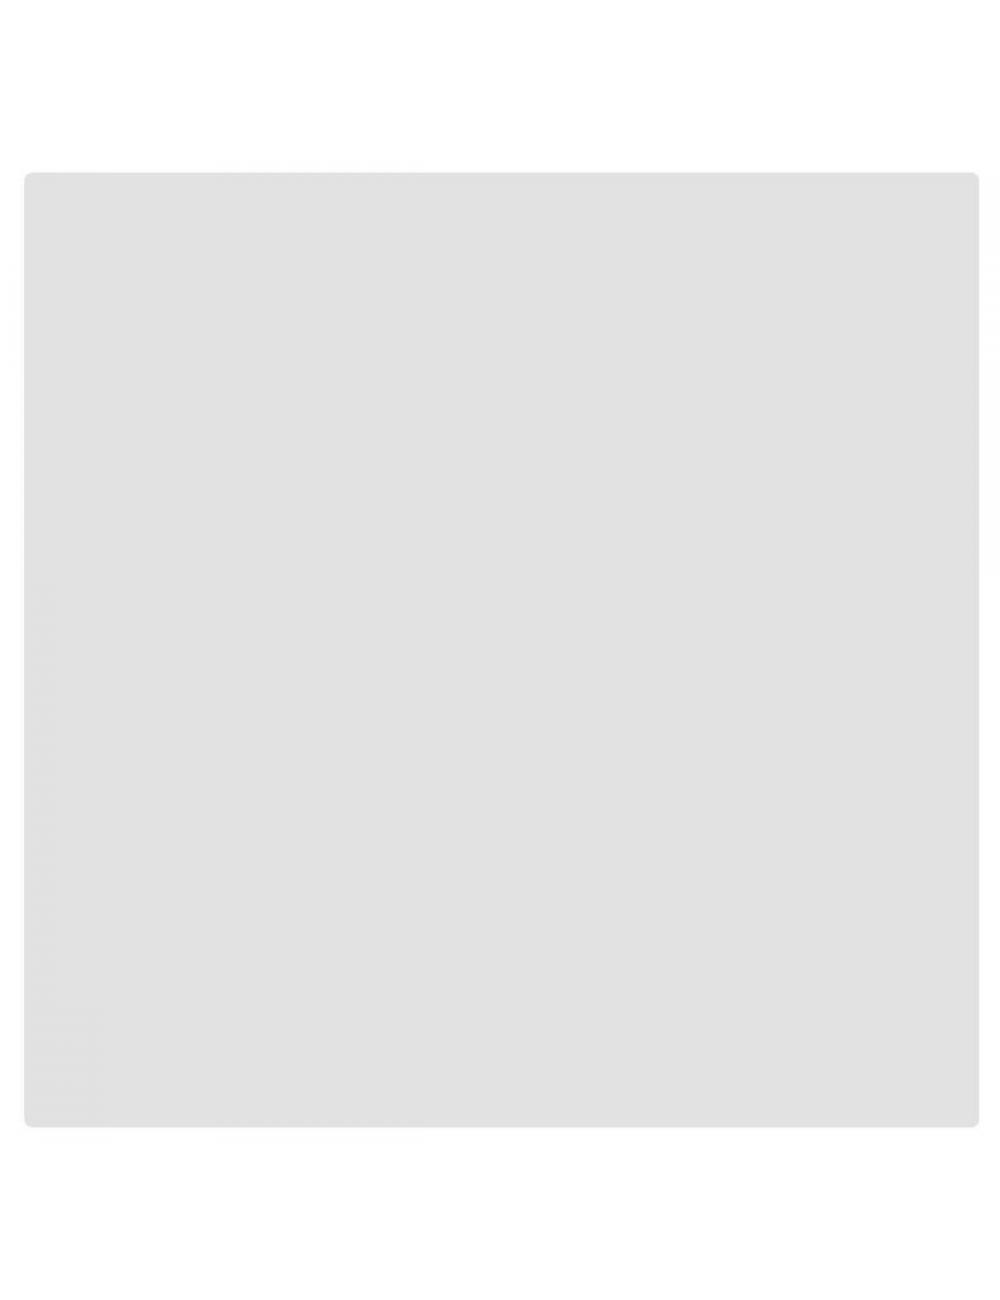 Litepanels - Gel Half White Diffusion para 1x1